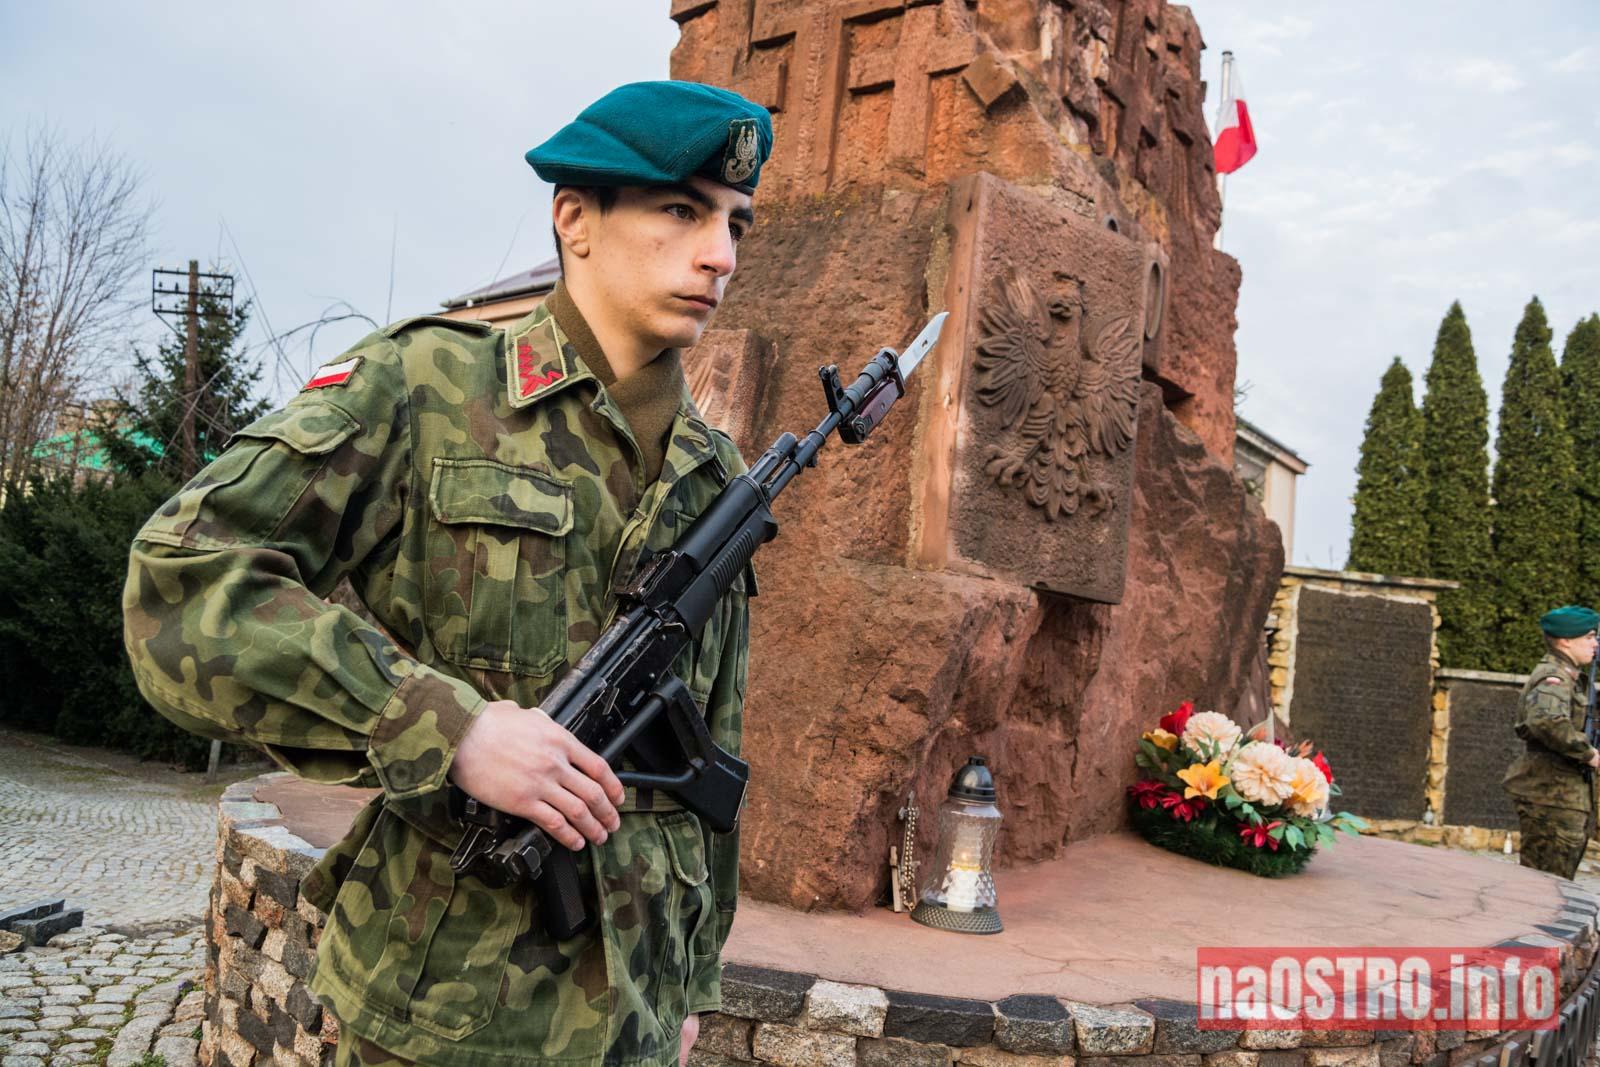 Pomnik katyński-5